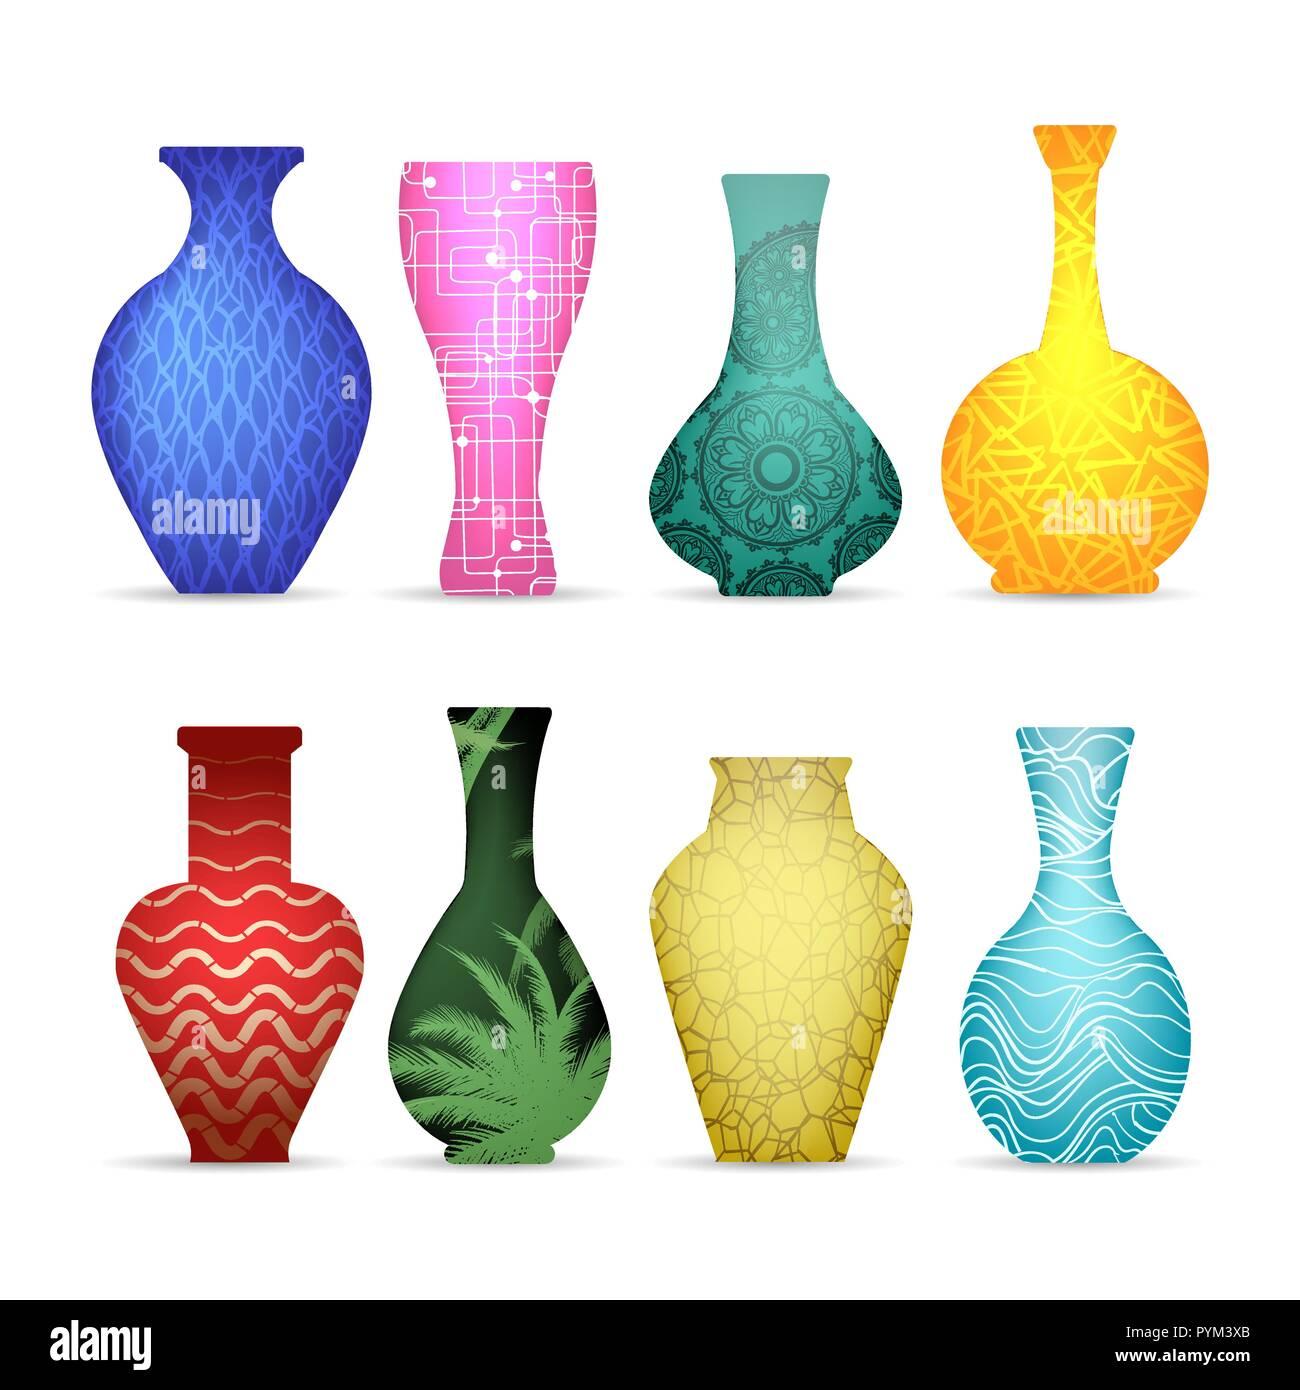 Modern vases. Ceramic vase set for interior, porcelain objects for on modern decorative baskets, modern decorative stools, unique vases, metallic gold vases, wall vases, accent decor vases, lost antique jade vases, bud vases, floor vases, modern decorative figurines, gold pilsner vases, contemporary vases, large vases, artistic vases, green circle shaped vases, modern red vase, home indoor vases, crystal vases, glass vases, green living room vases,